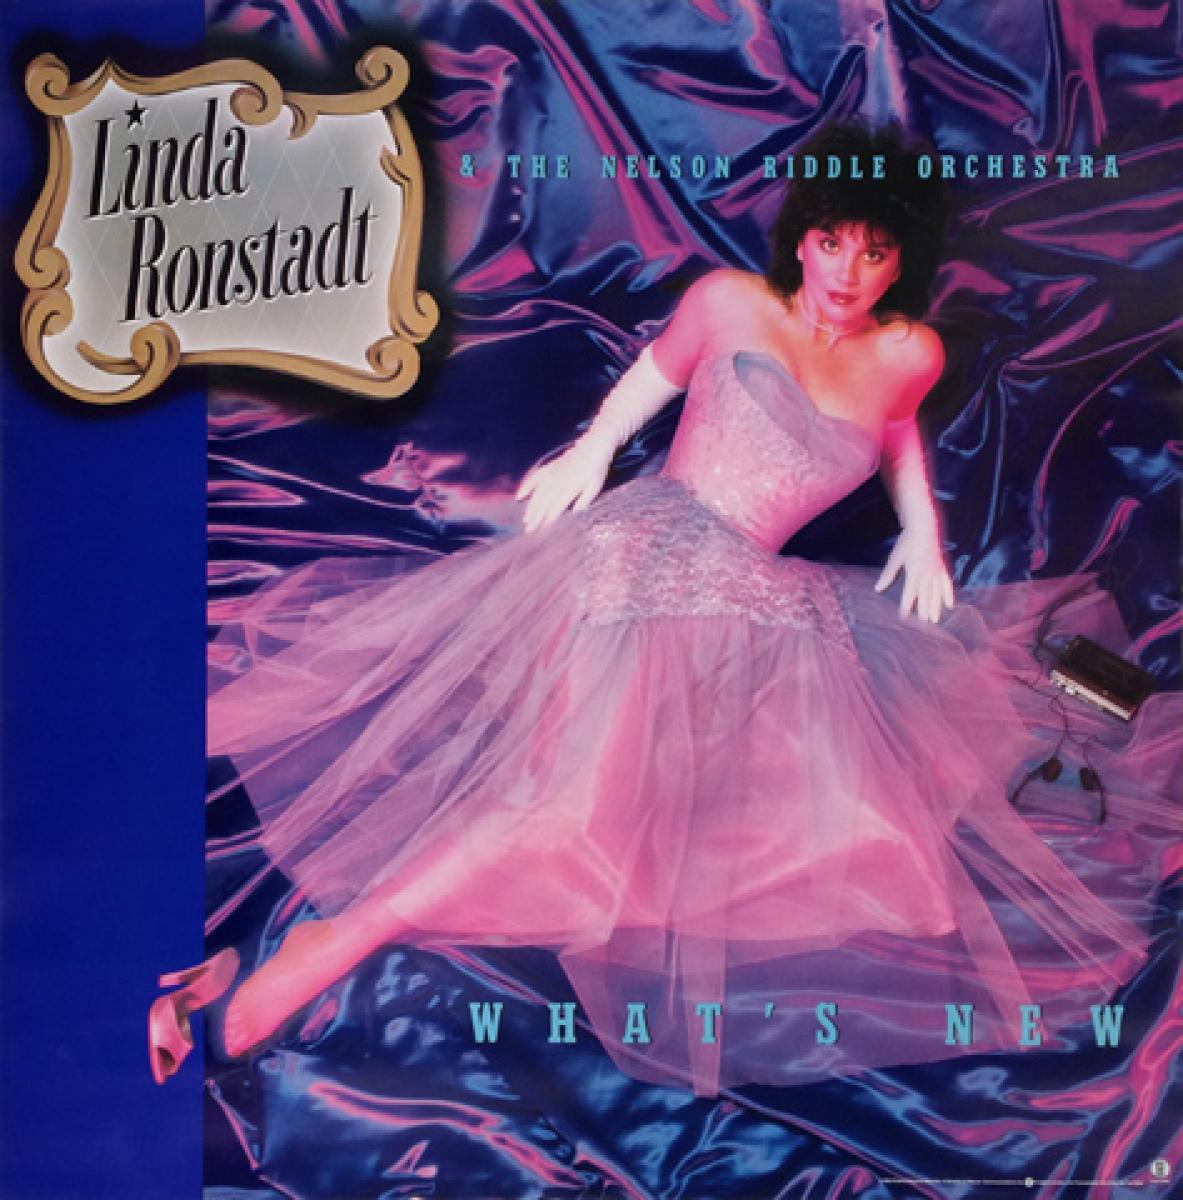 Linda Ronstadt Vintage Concert Poster 1983 At Wolfgang S